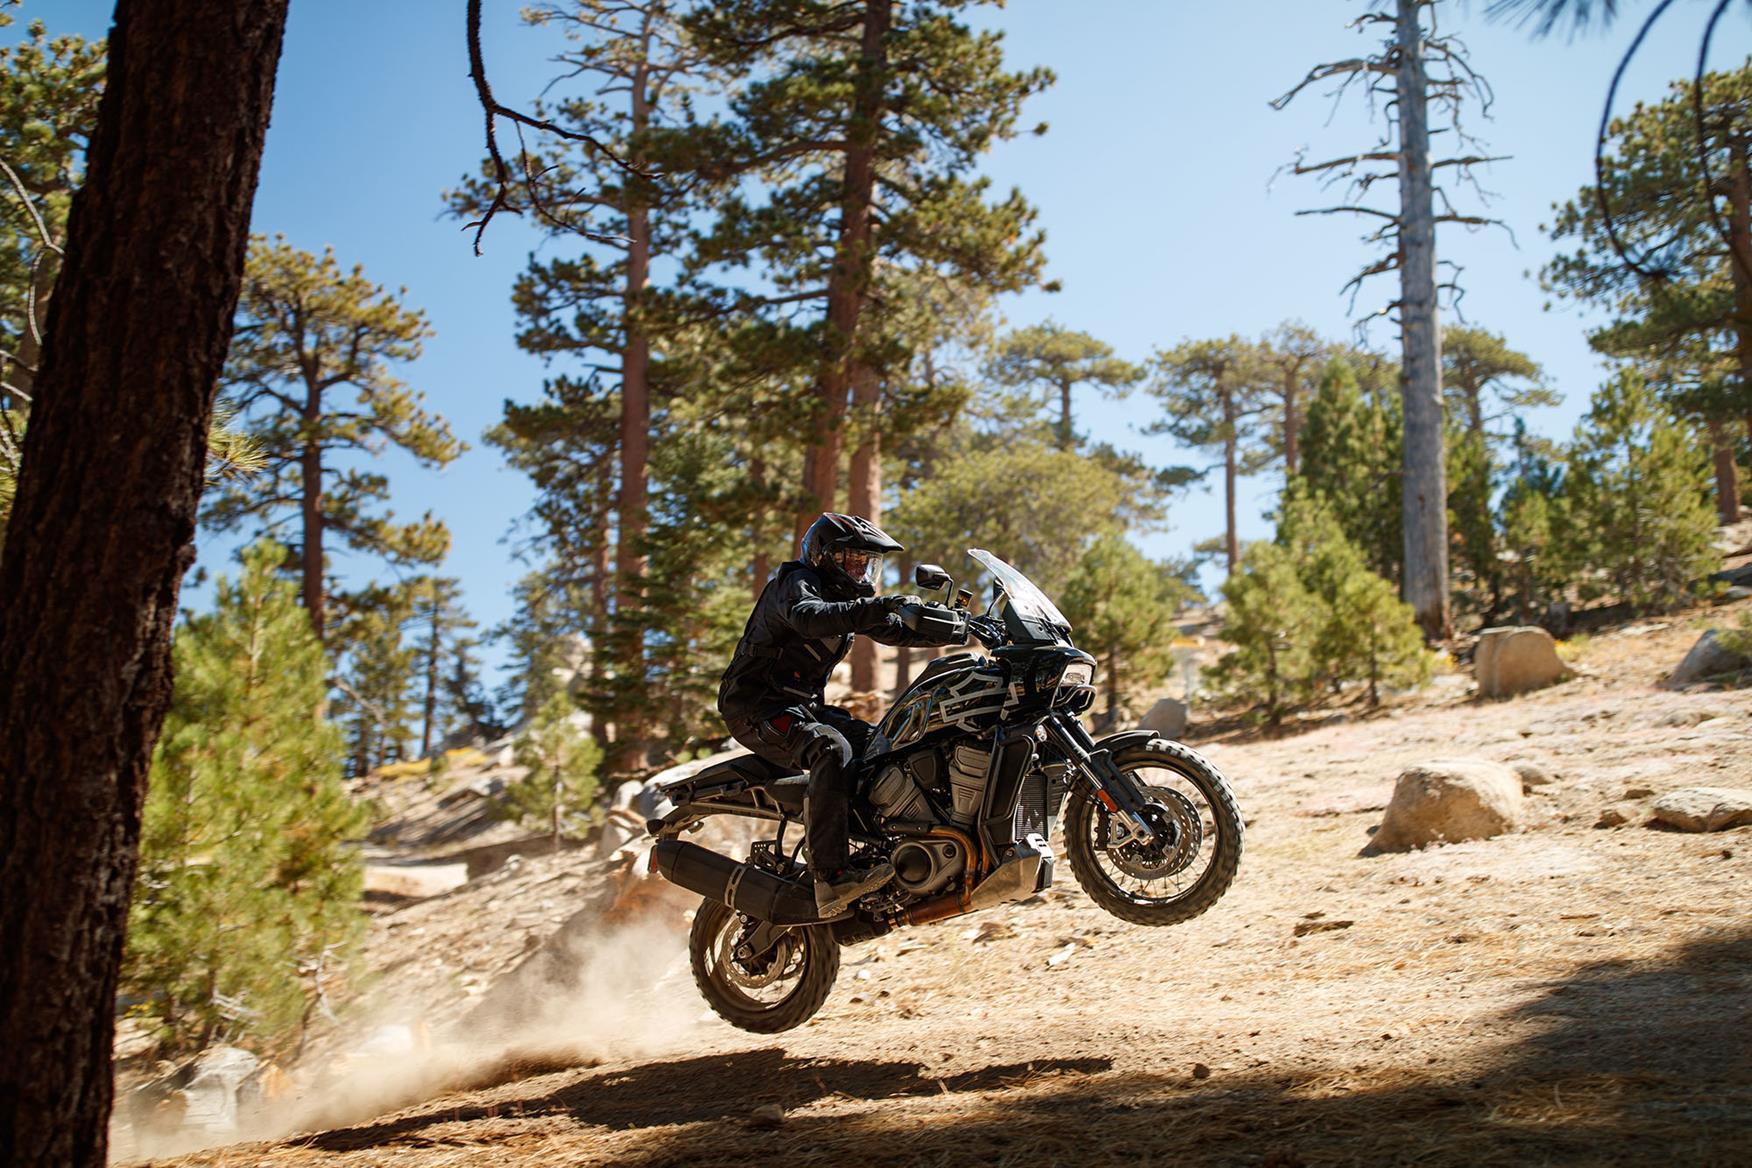 The Harley-Davidson Pan America